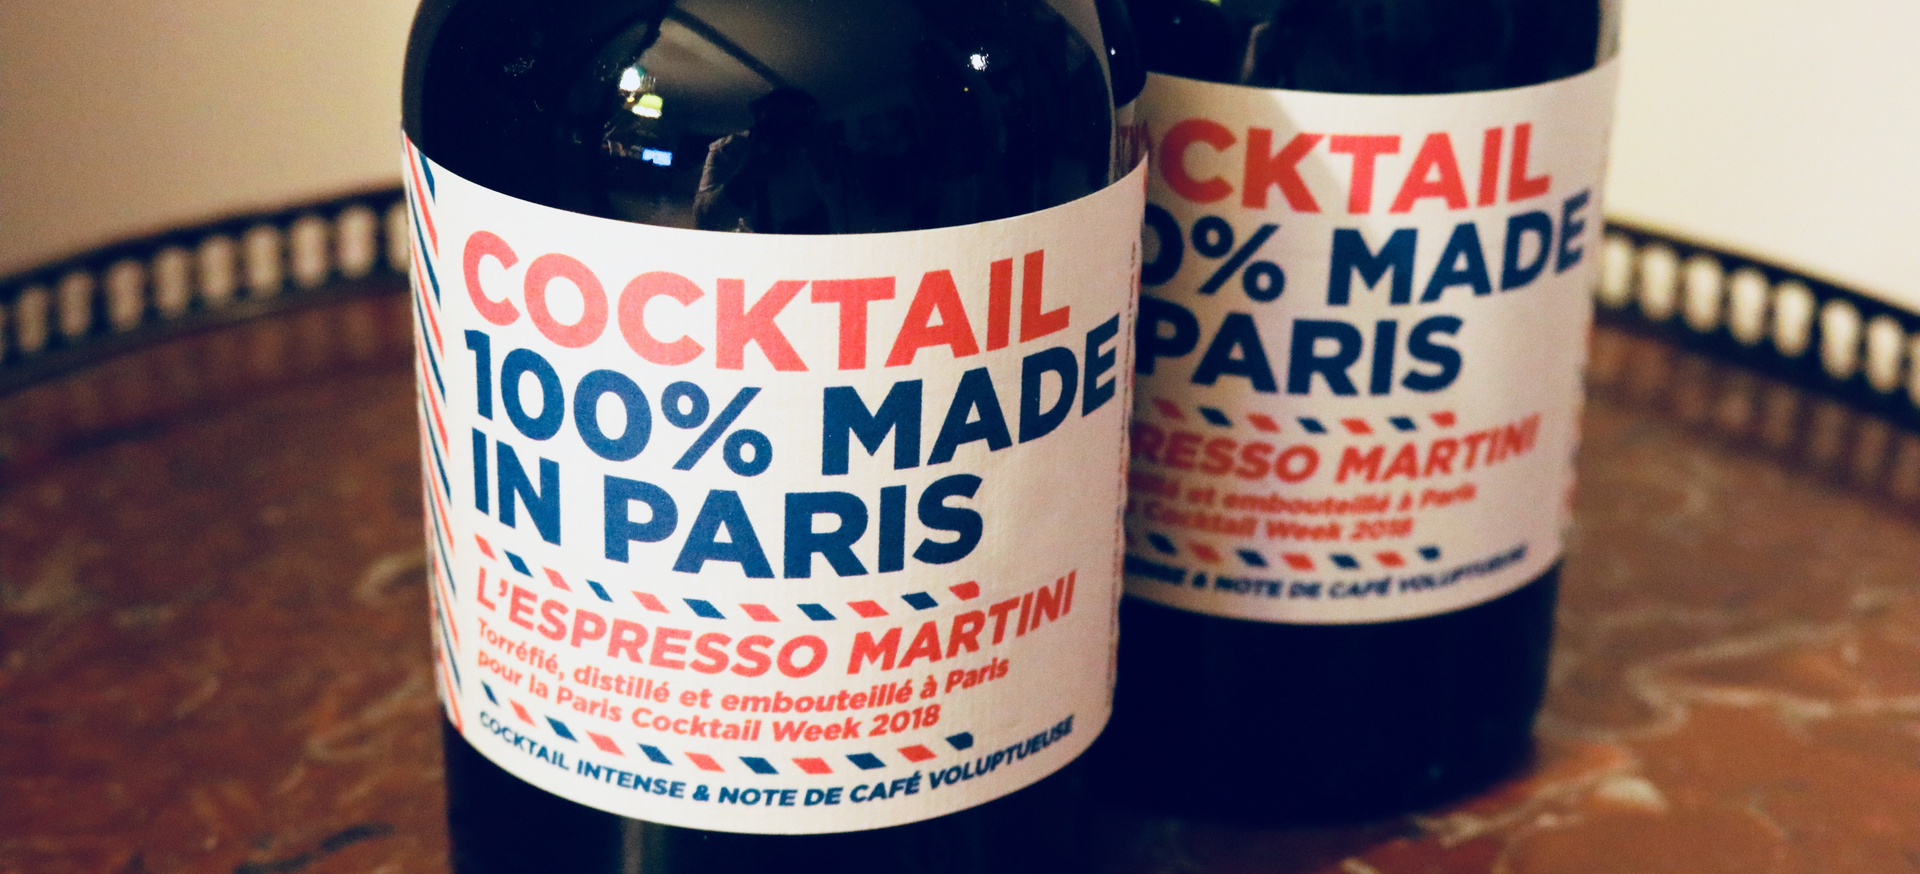 paris cocktail week cocktail 100% made in paris